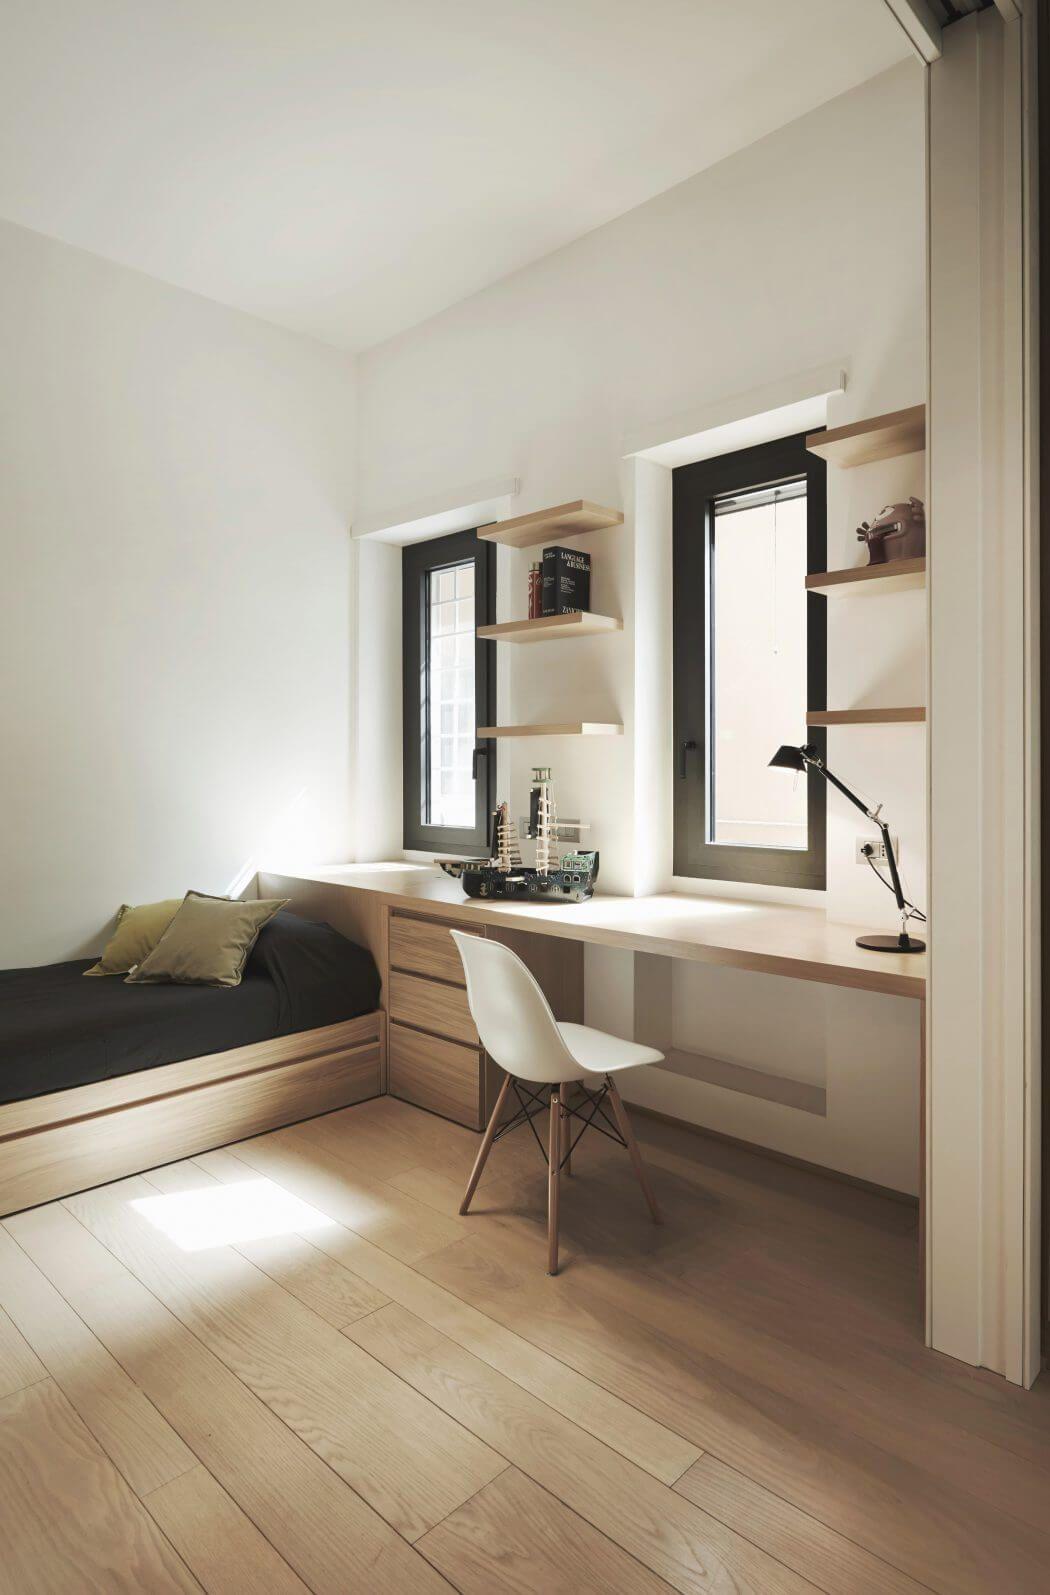 j apartmentcarola vannini | office | pinterest | ambiance